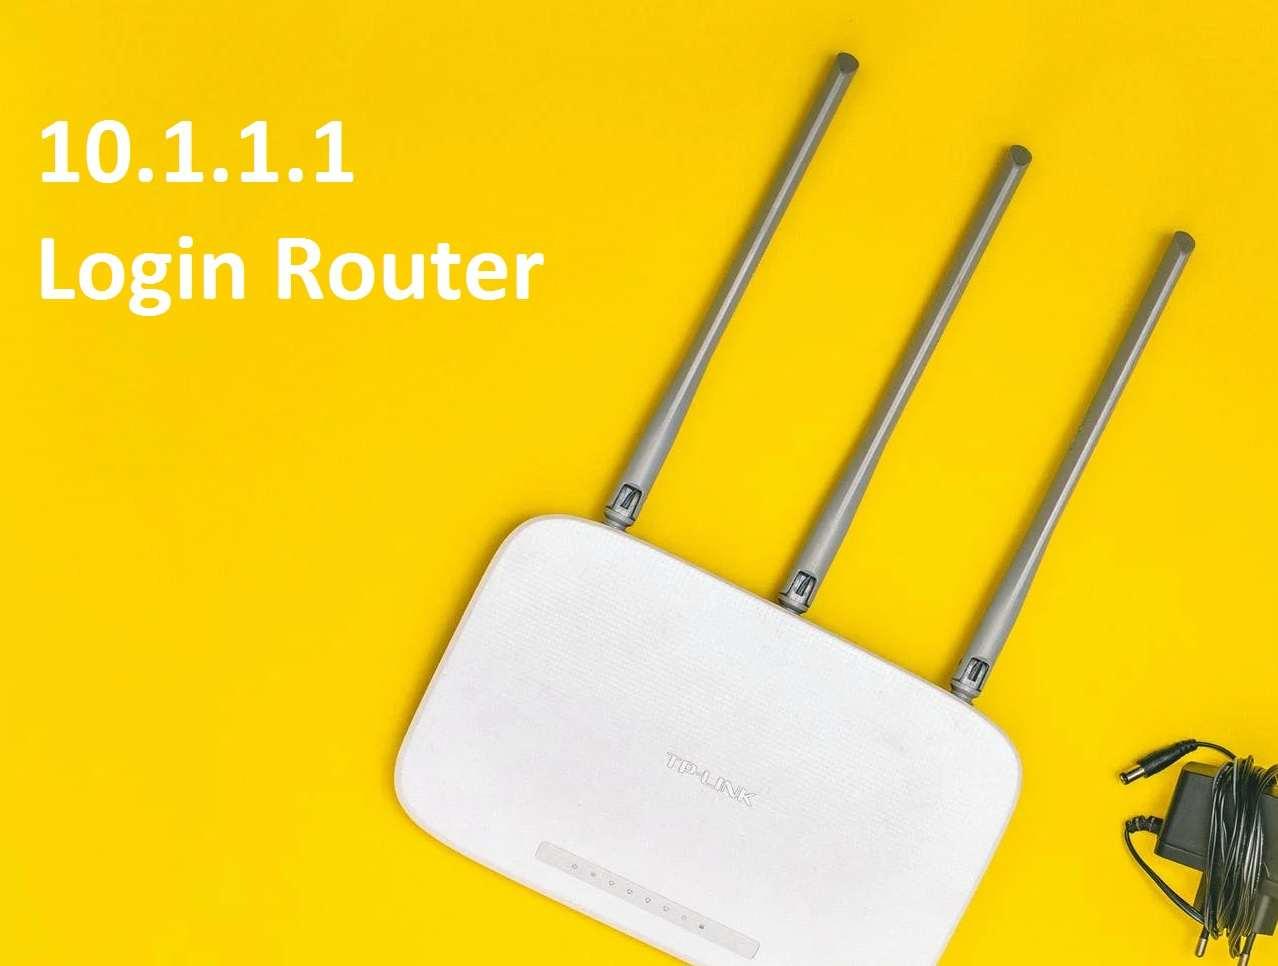 10.1.1.1 Default Router IP Login